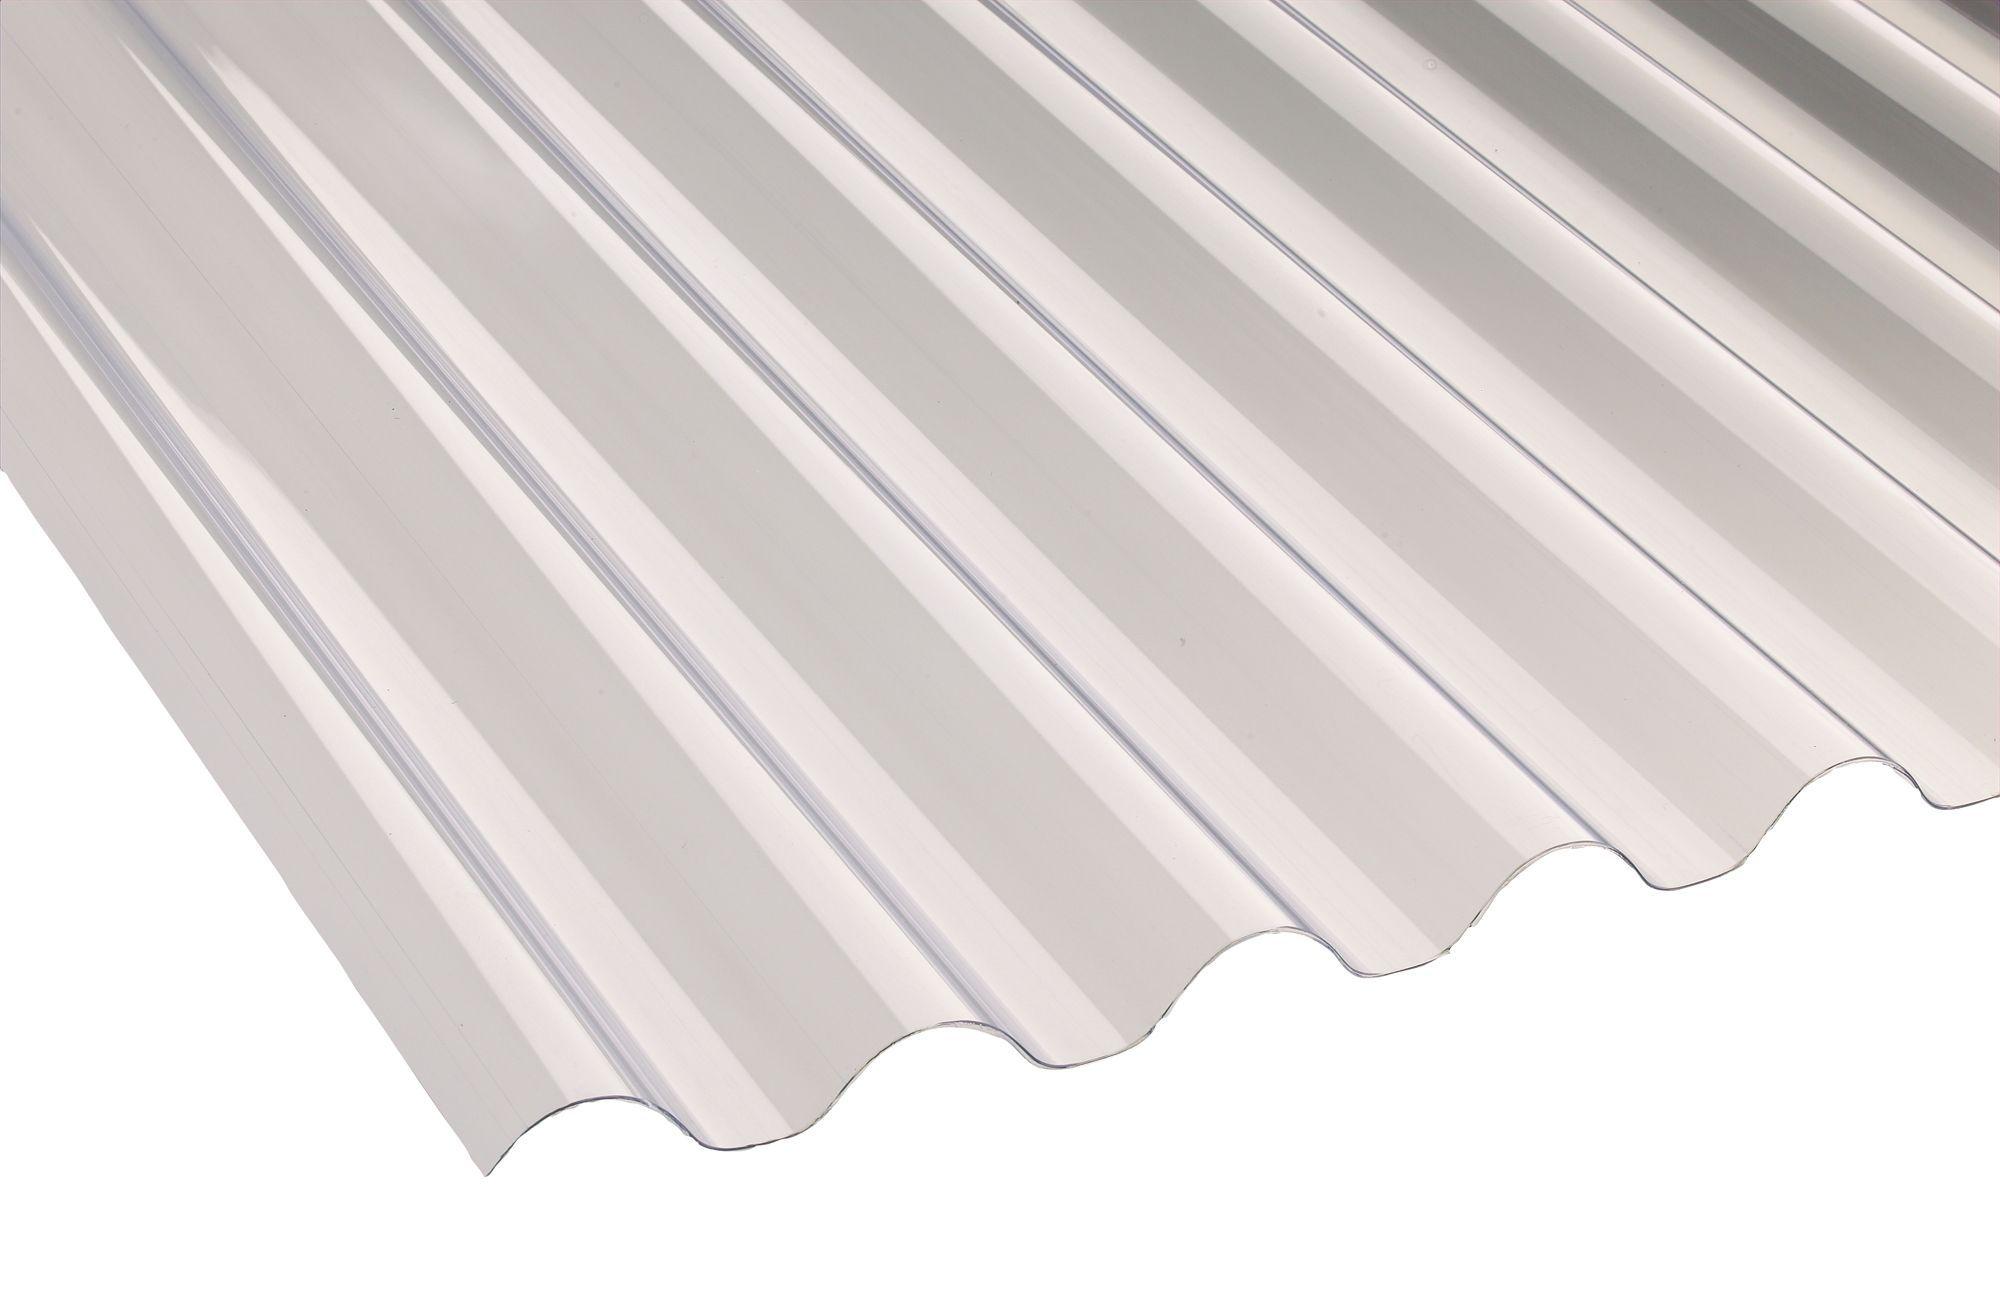 Pvc Roofing Sheet 3000mm X 660mm Departments Diy At B Q Pvc Roofing Sheets Corrugated Plastic Roofing Sheets Corrugated Roofing